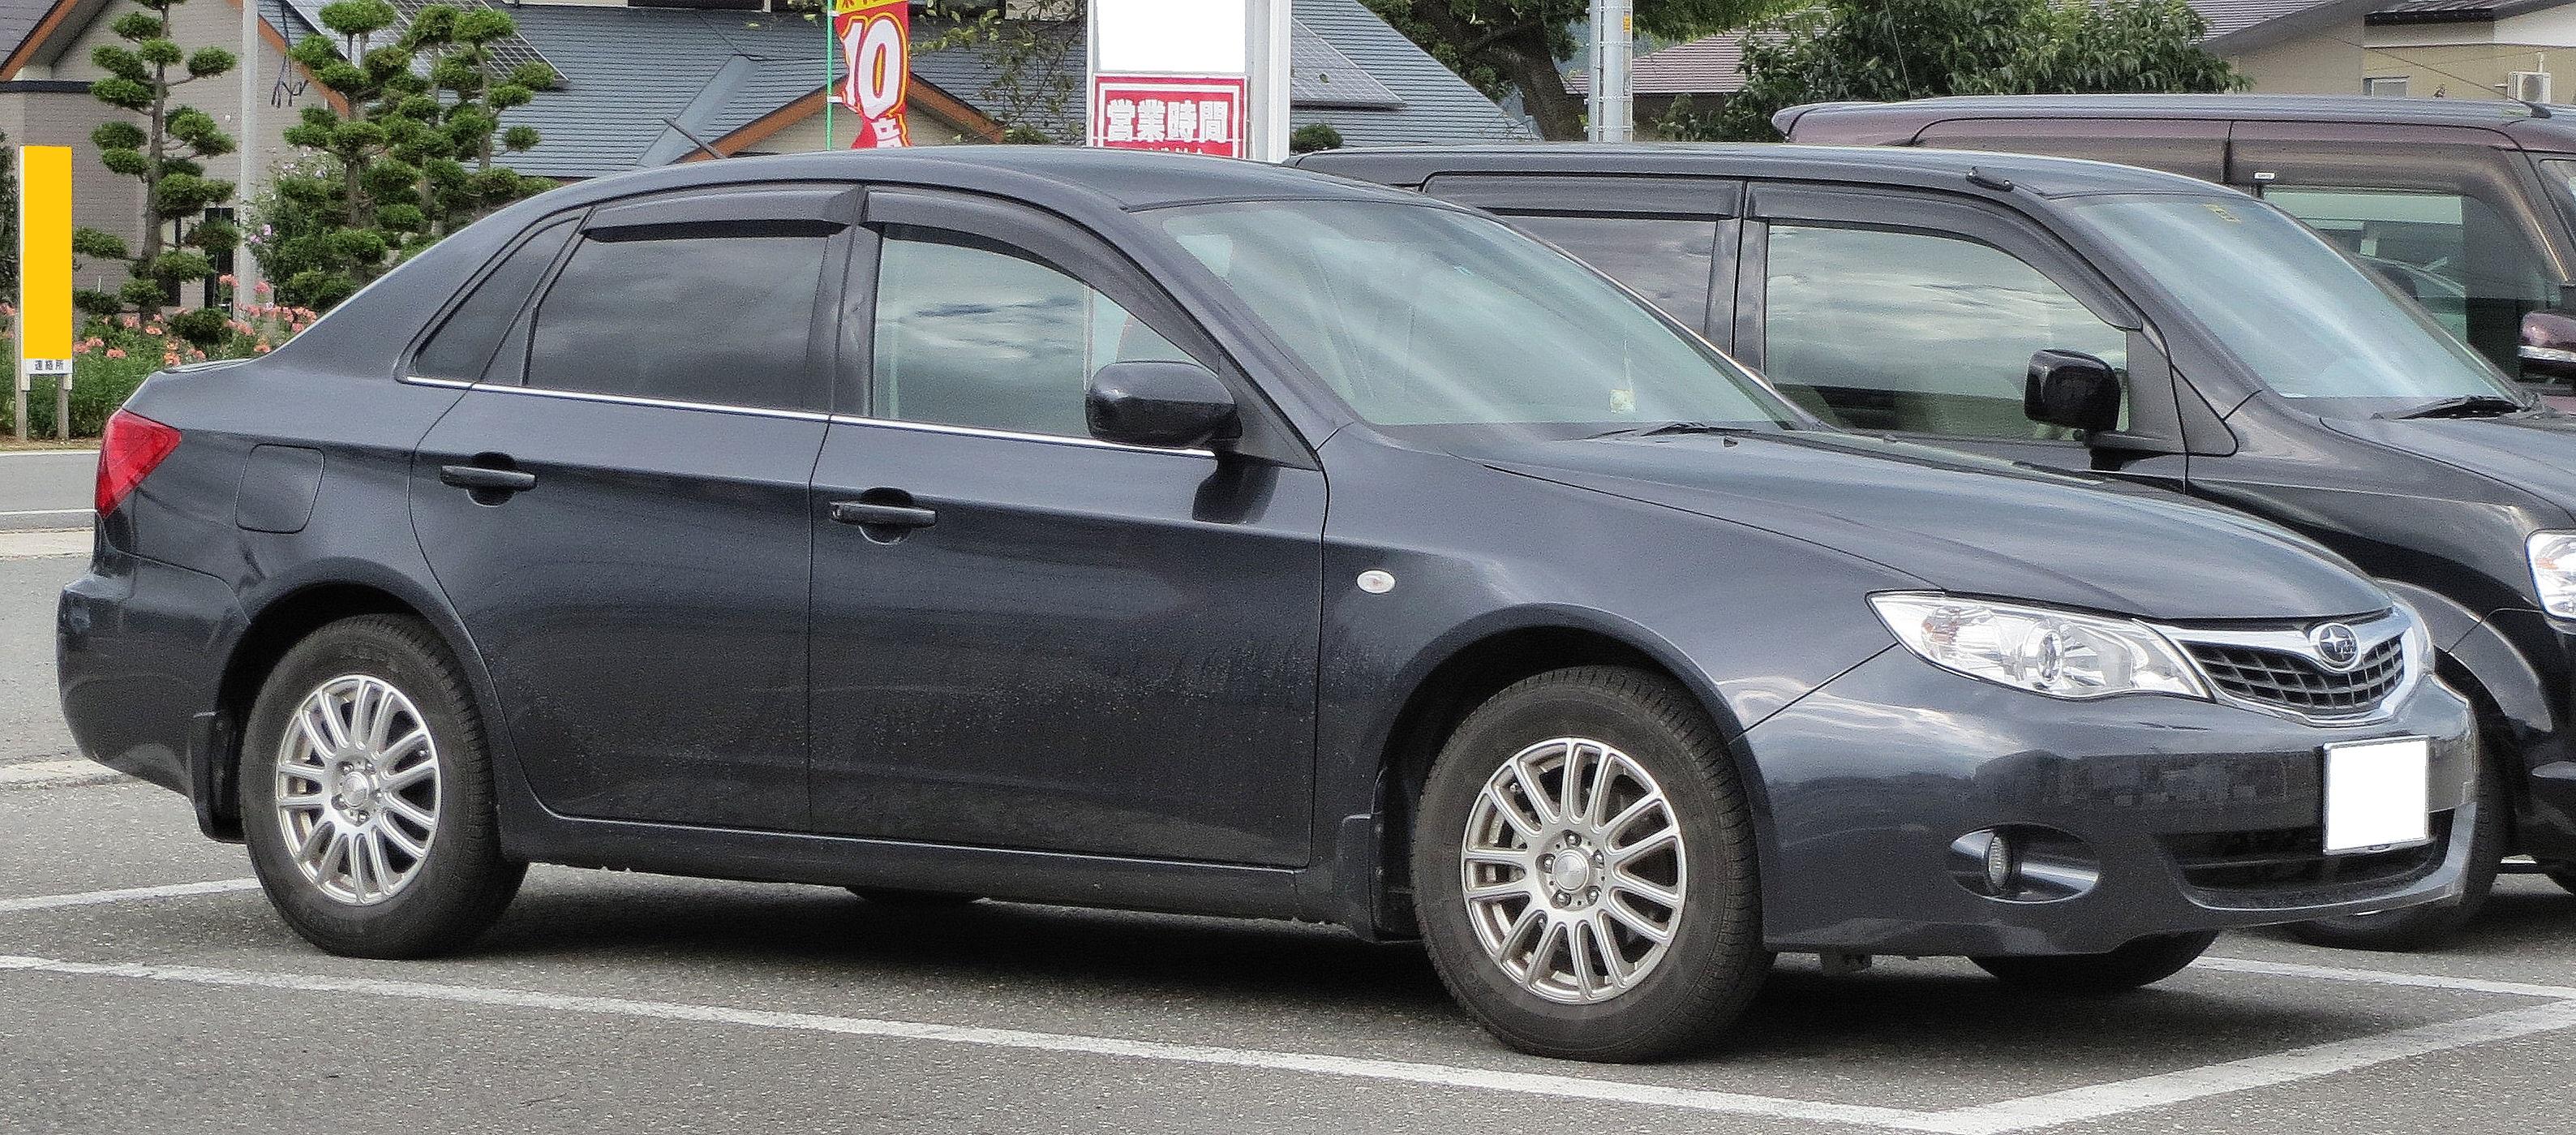 File:Subaru Impreza Anesis 1.5i-L AWD.JPG - Wikimedia Commons